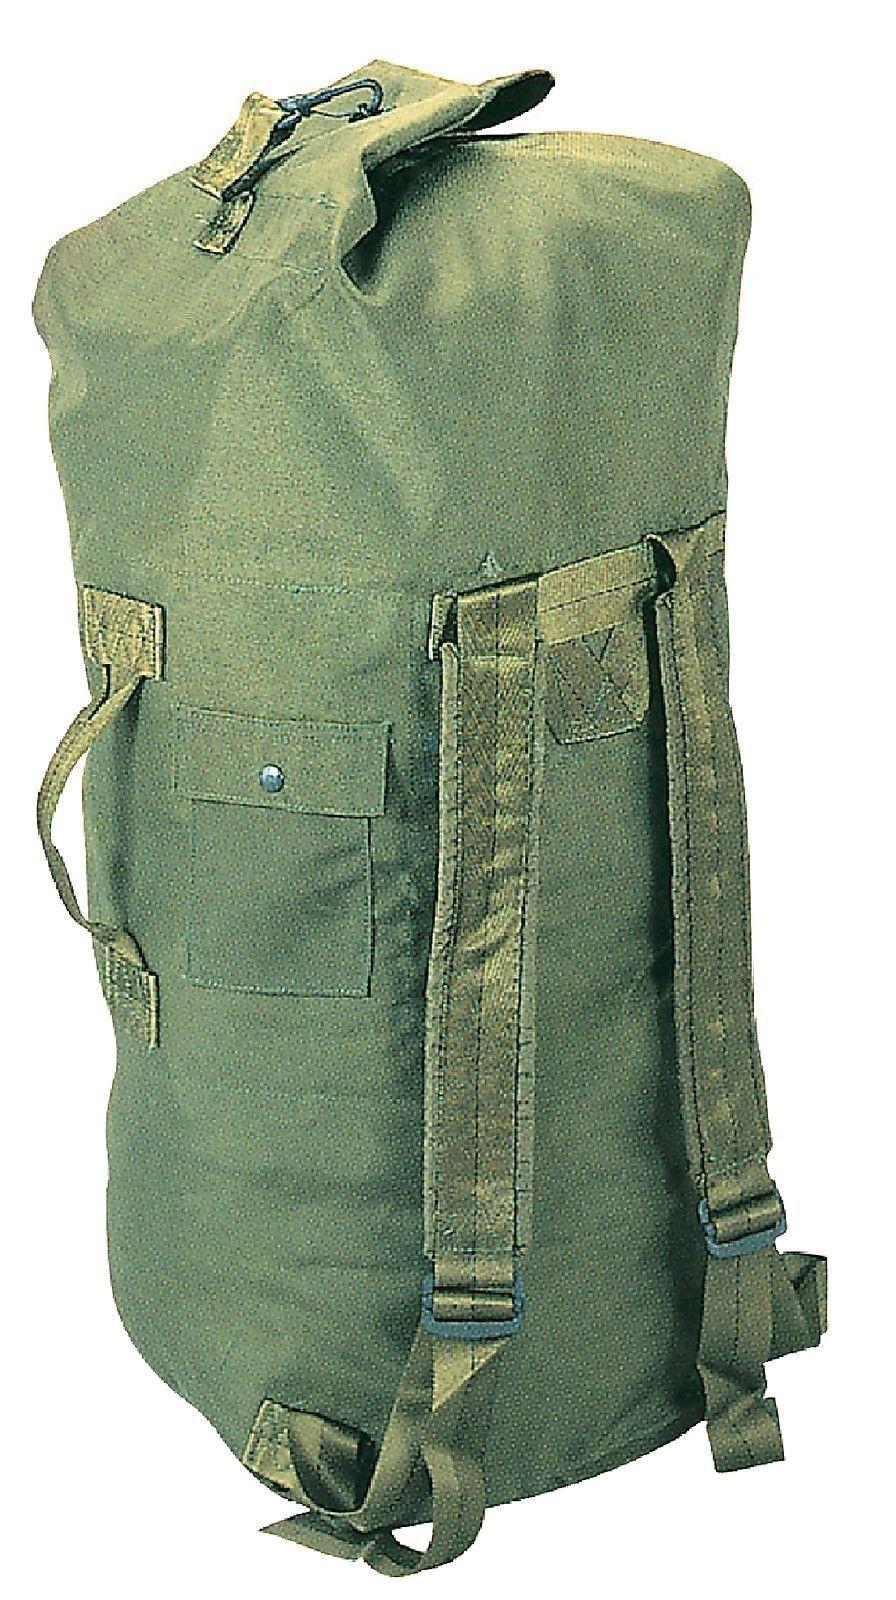 Military Type Enhanced Double Strap Duffle Bag - Nylon Duffle Gear Packs  Bags 443adf890f1b